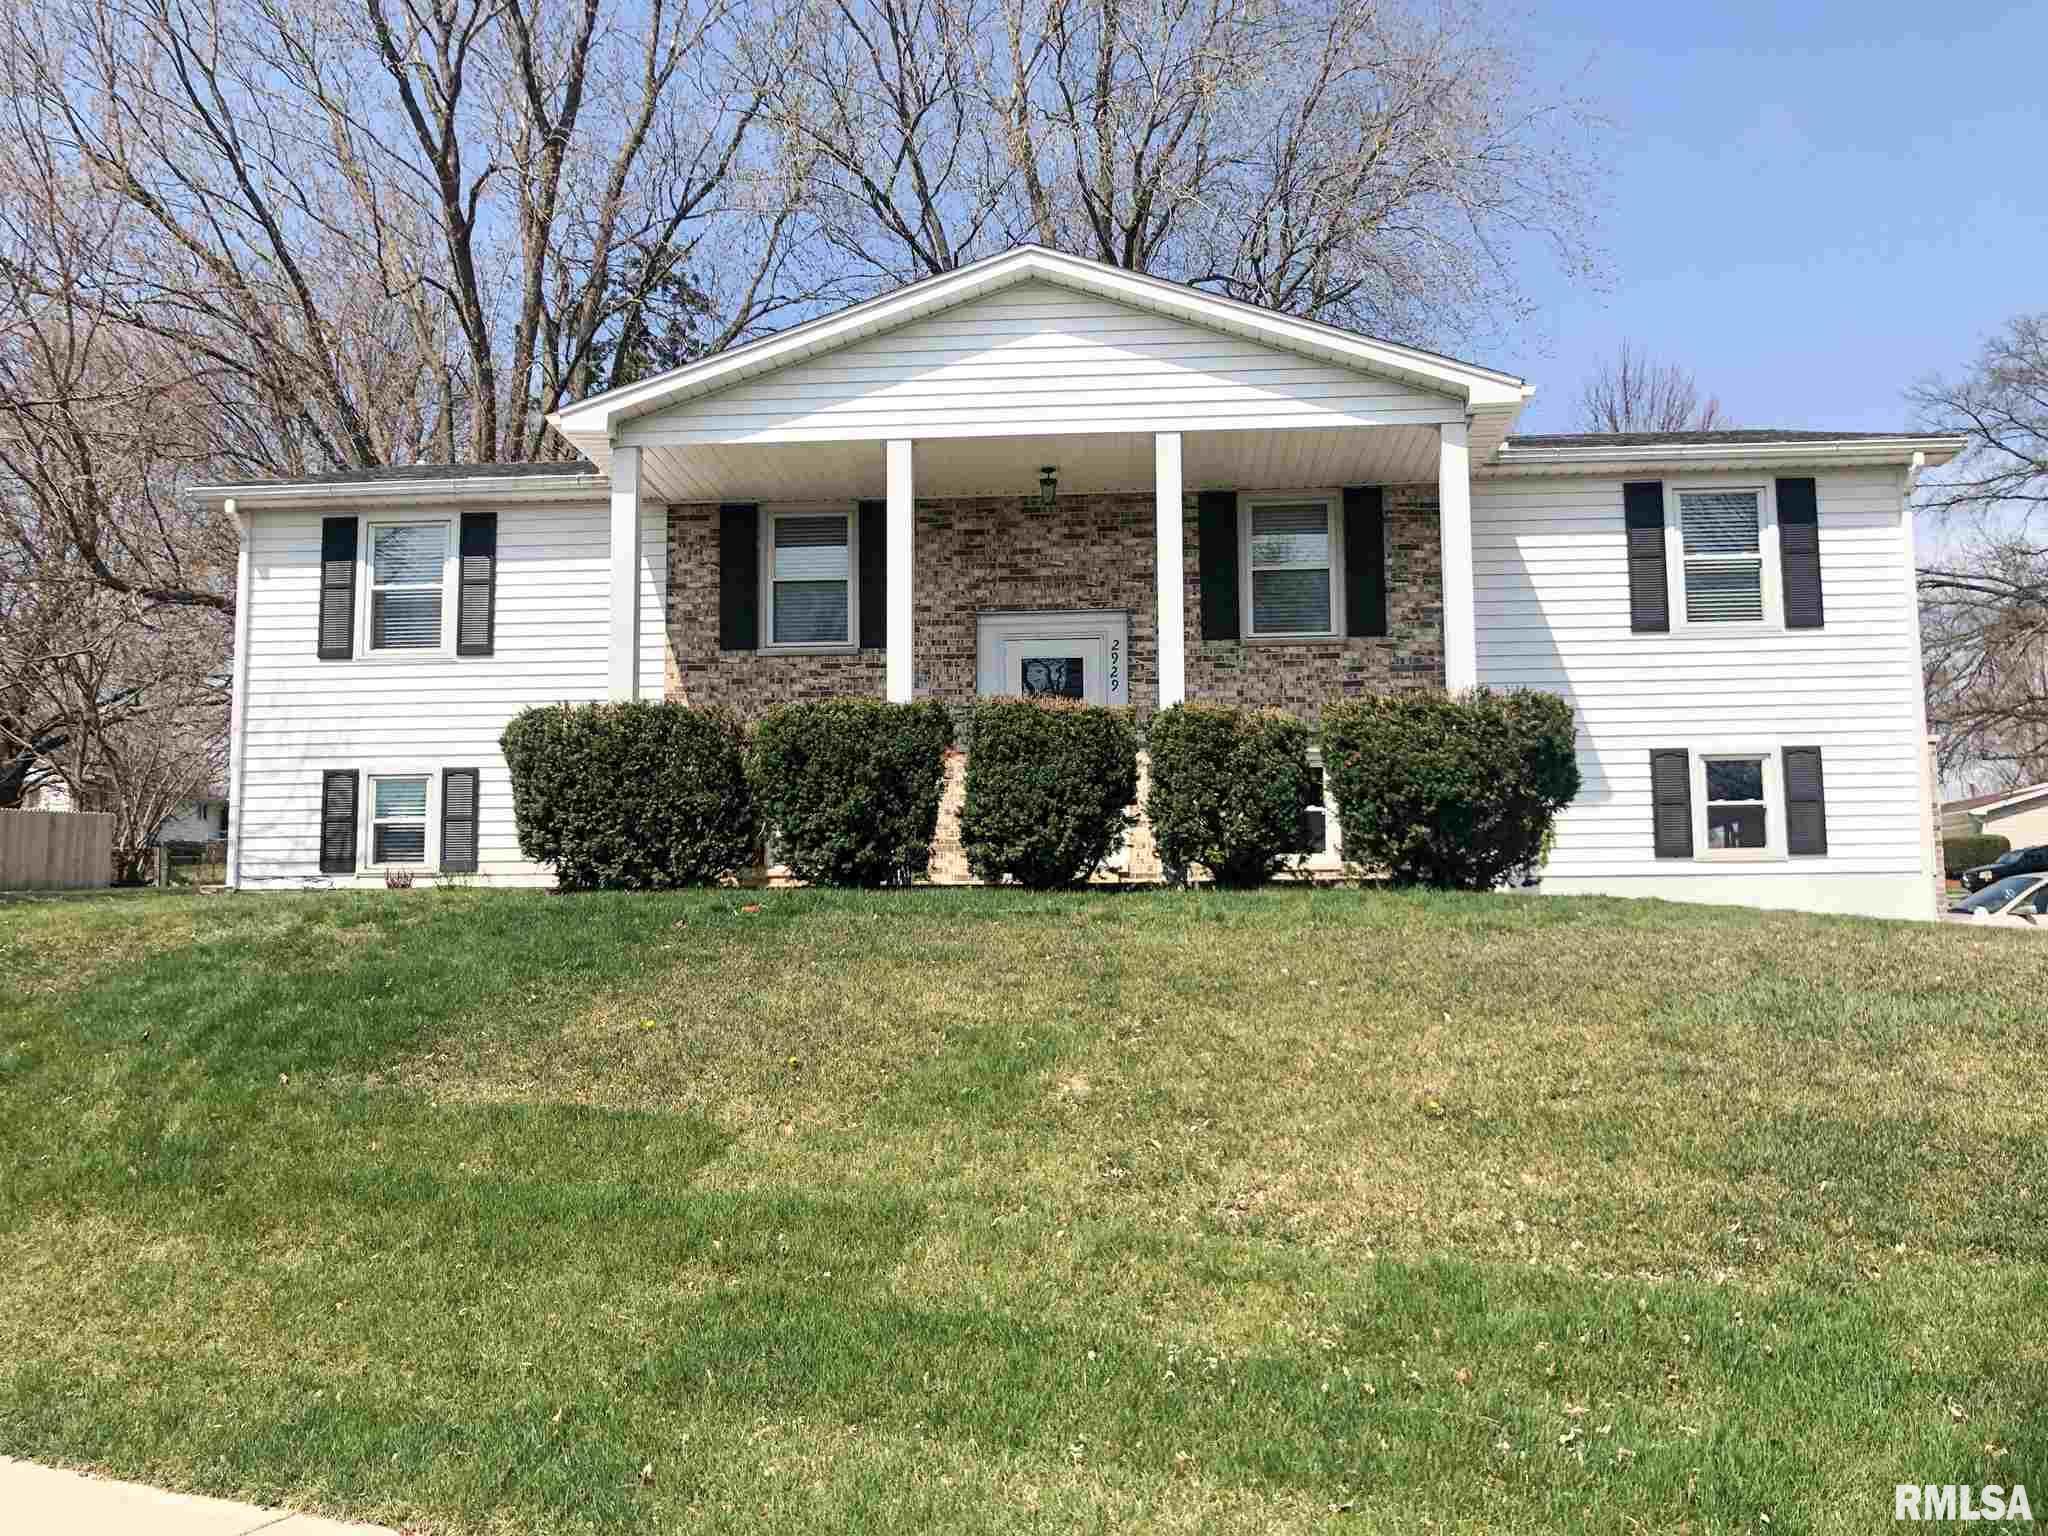 2929 W PARKRIDGE Property Photo - Peoria, IL real estate listing